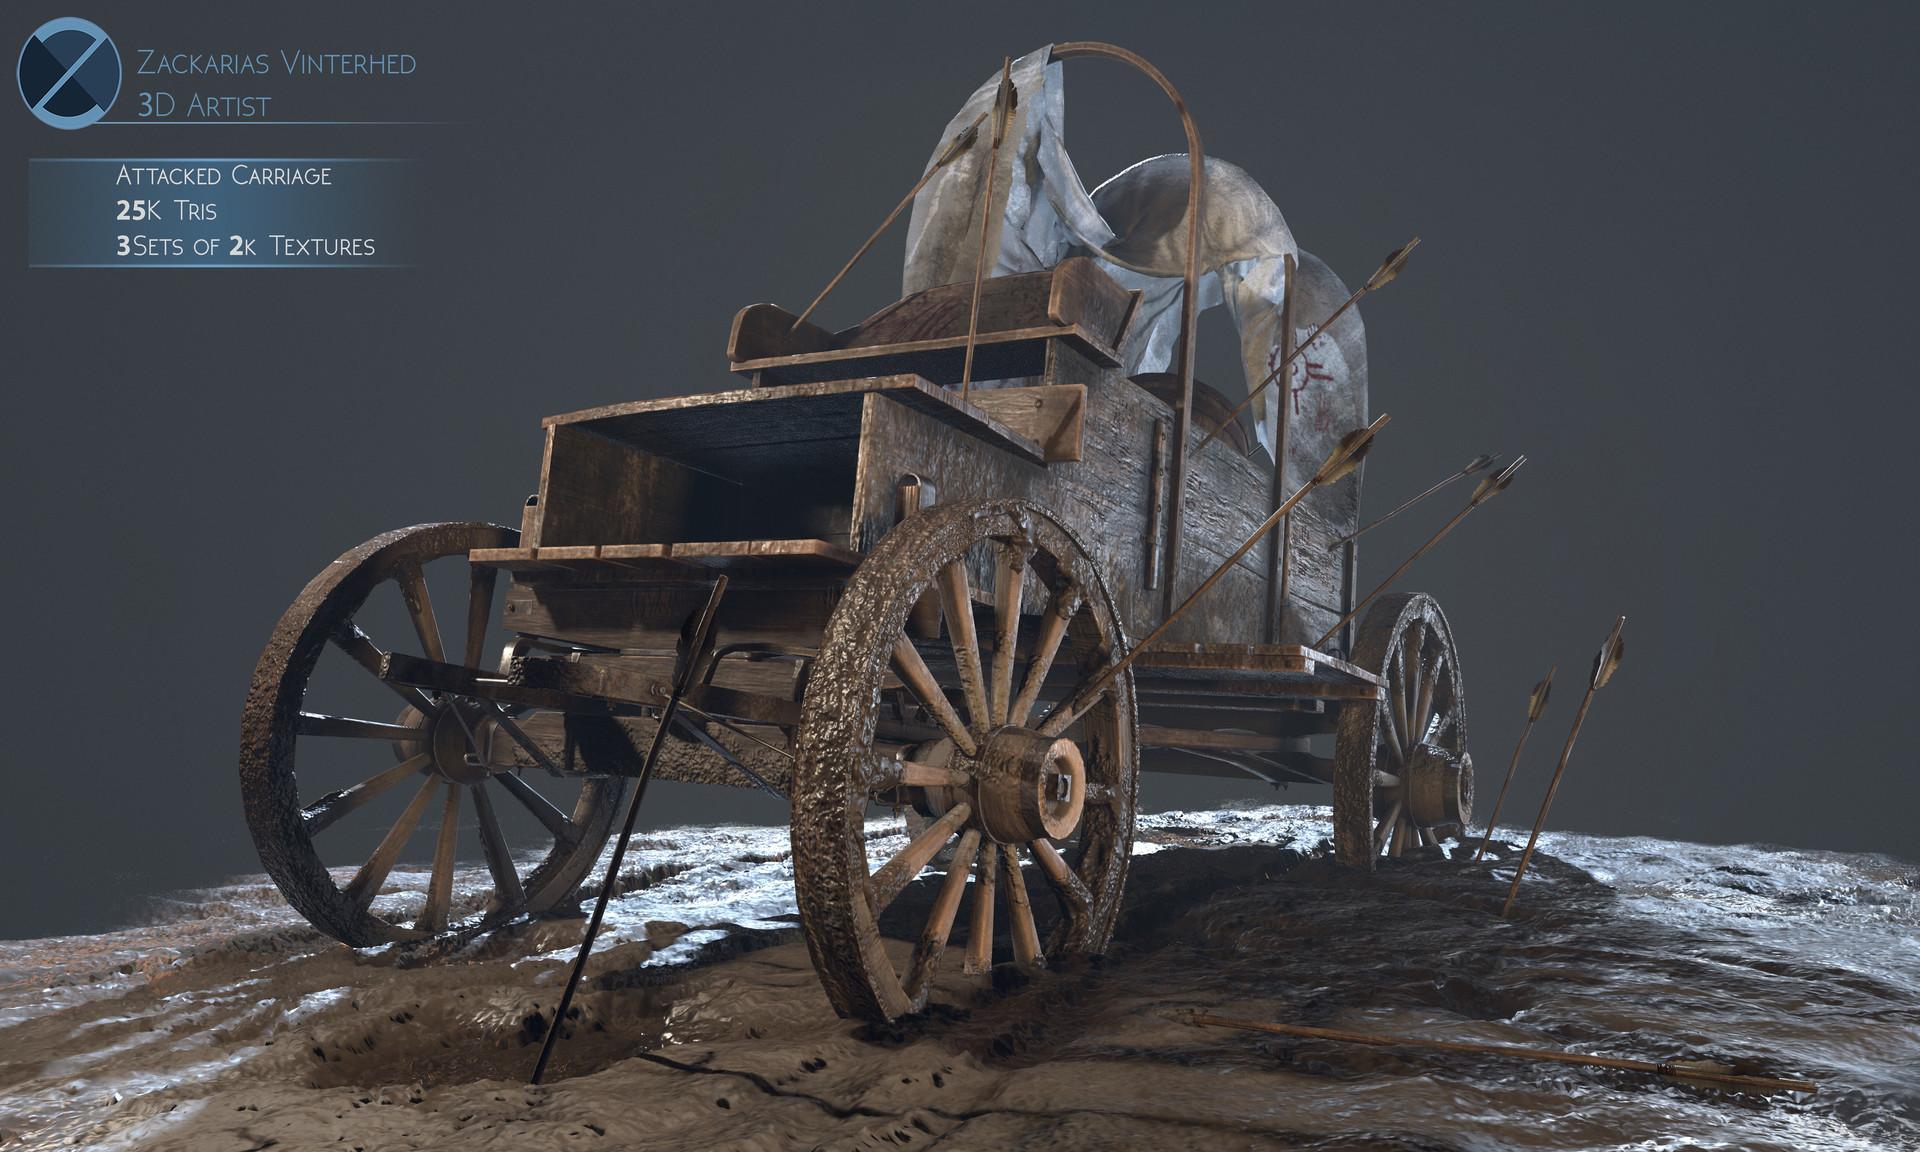 Zackarias vinterhed carriage 03